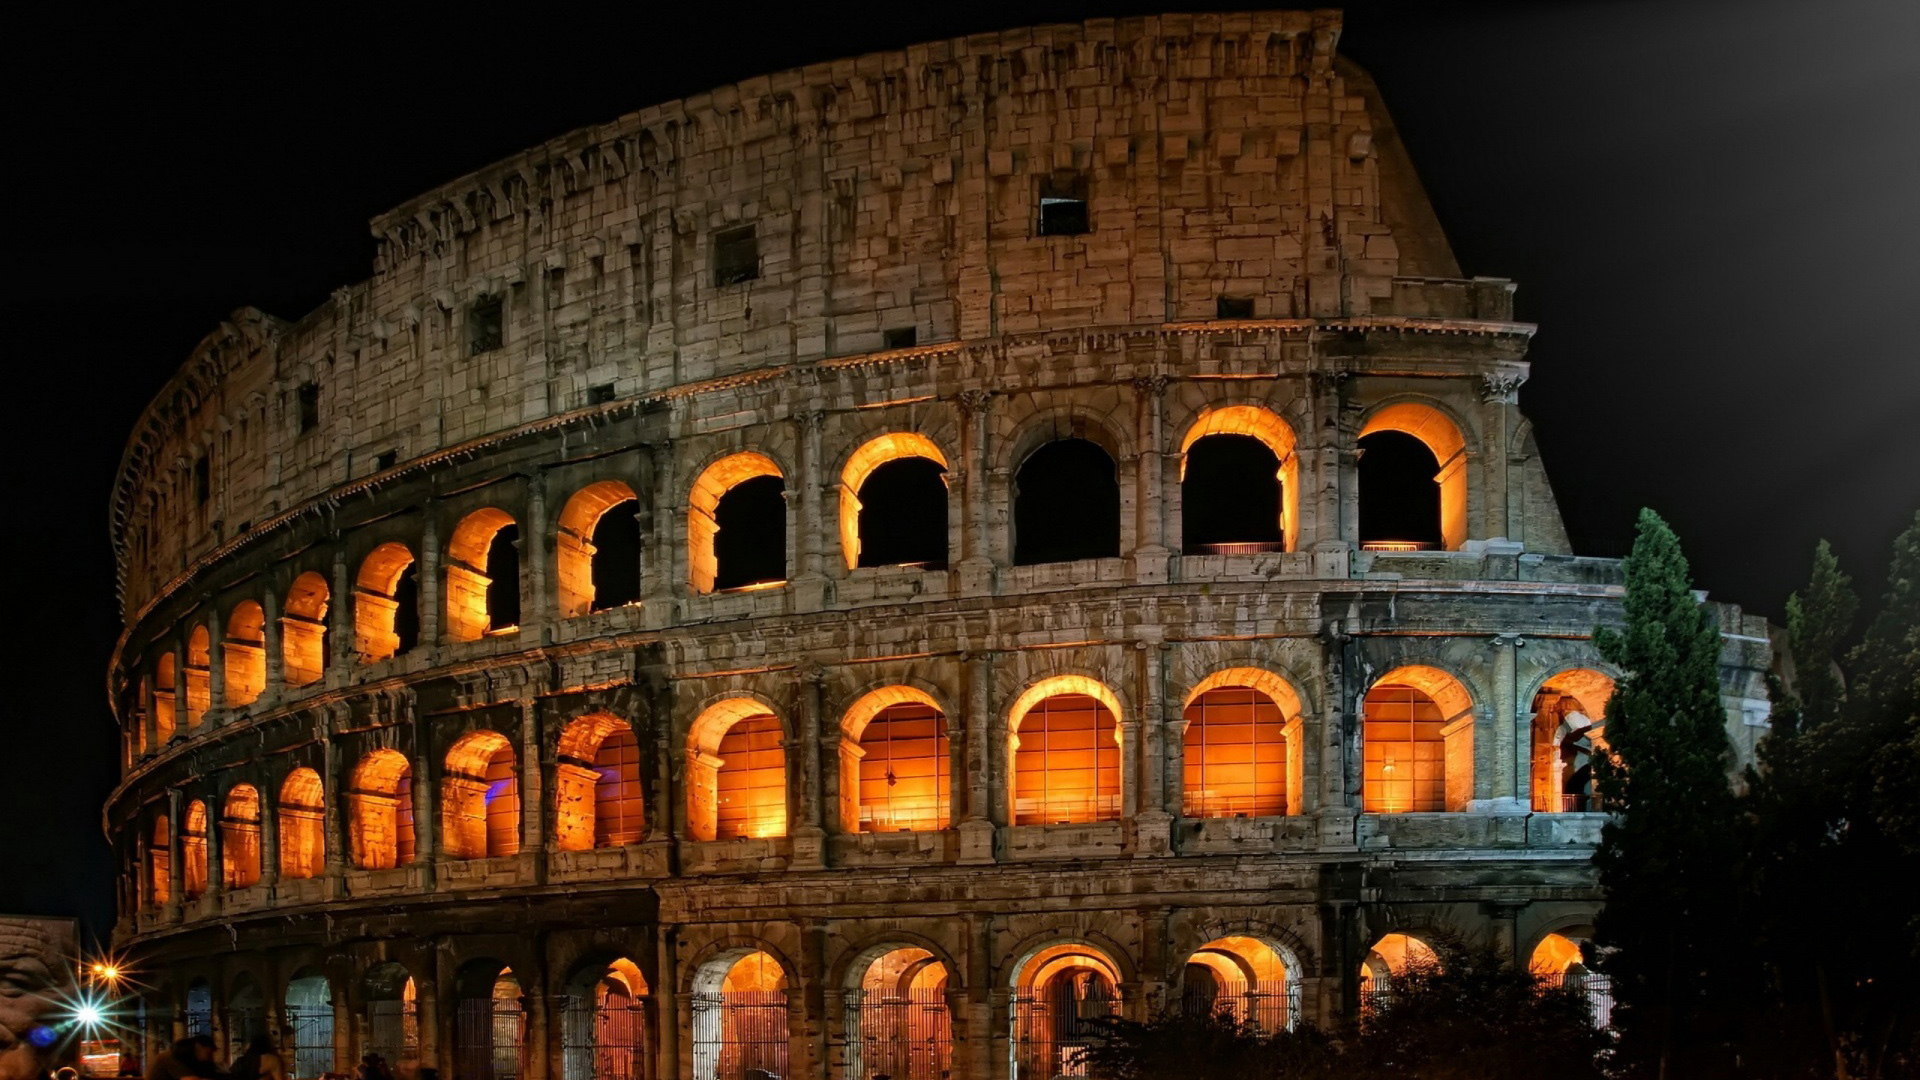 Roman Colosseum Hd Wallpaper